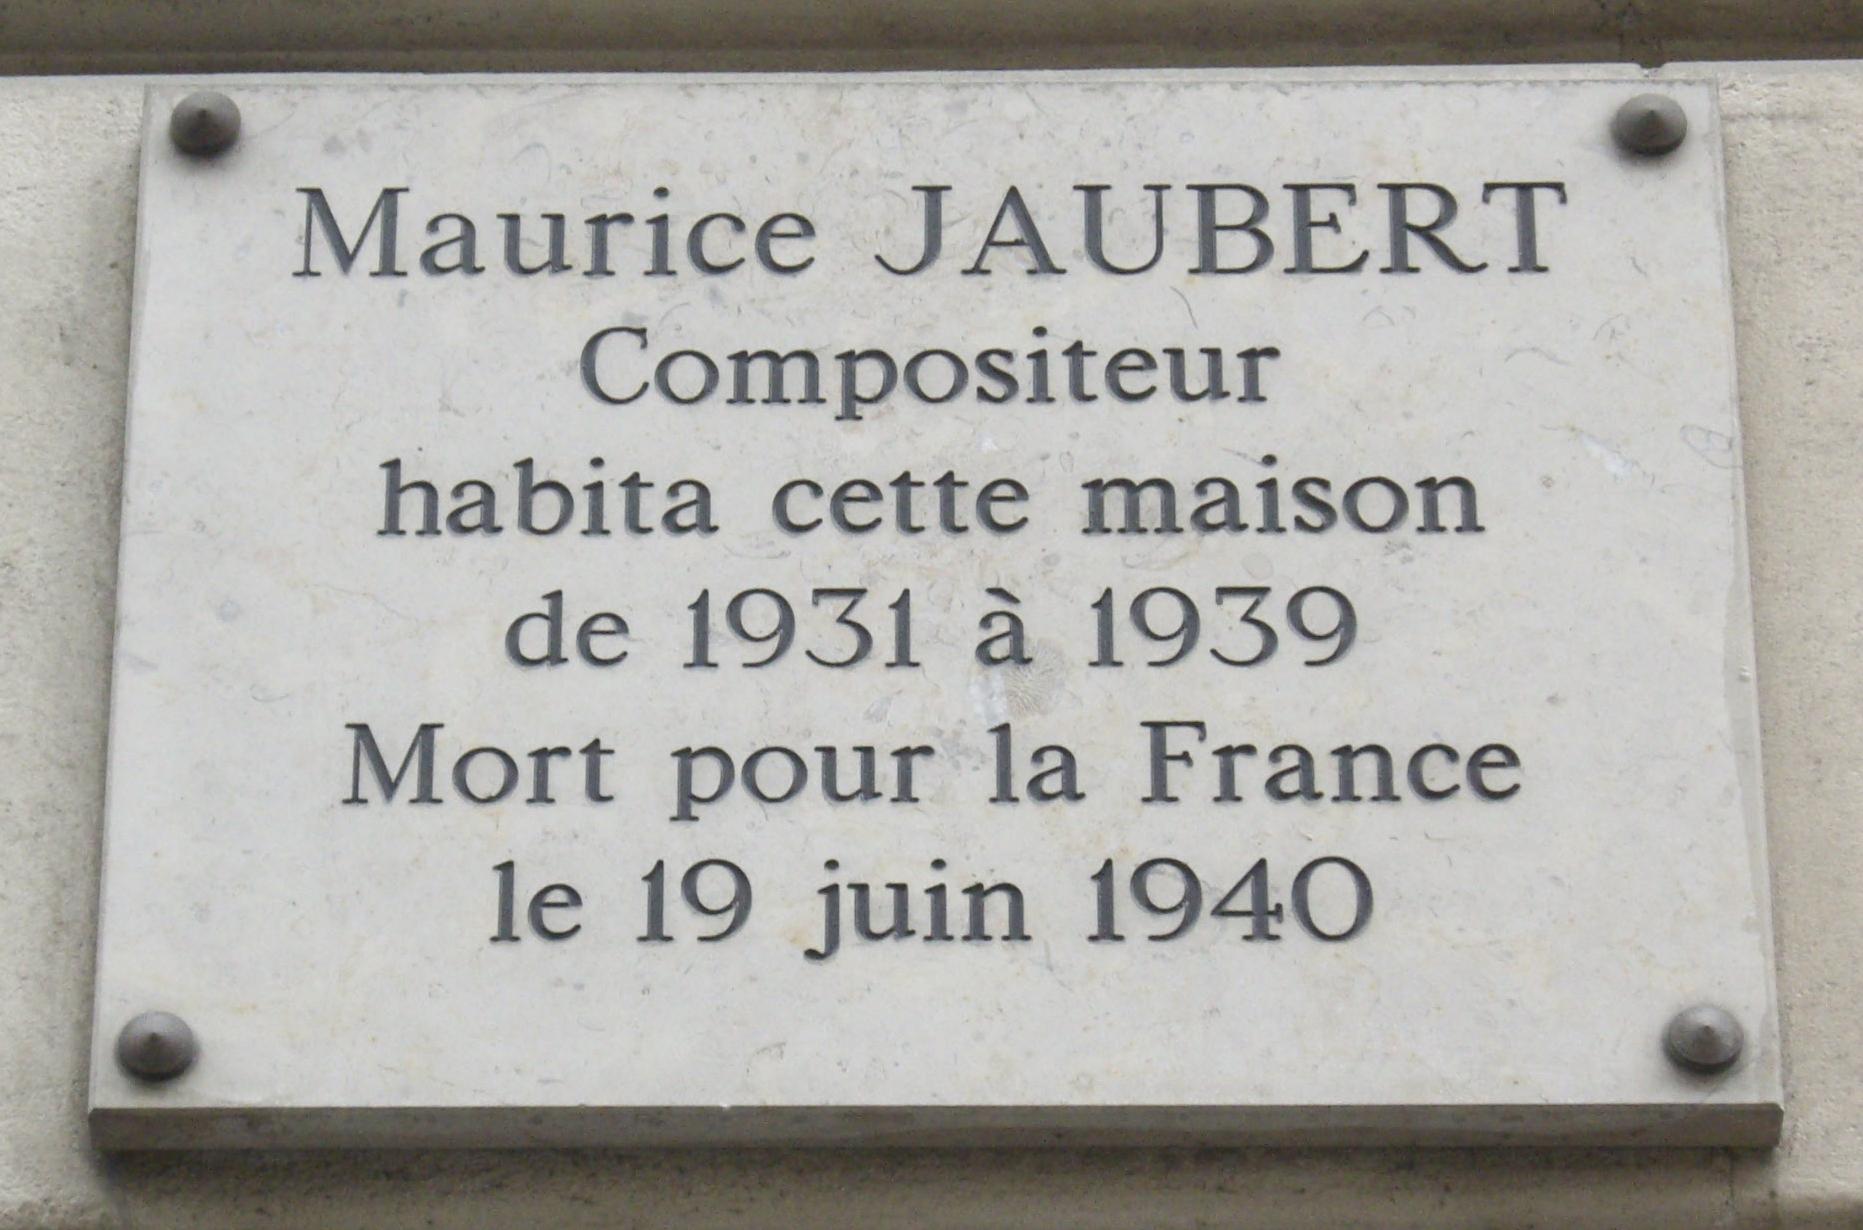 23 Rue Du Cherche Midi file:plaque maurice jaubert, 98 rue du cherche-midi, paris 6